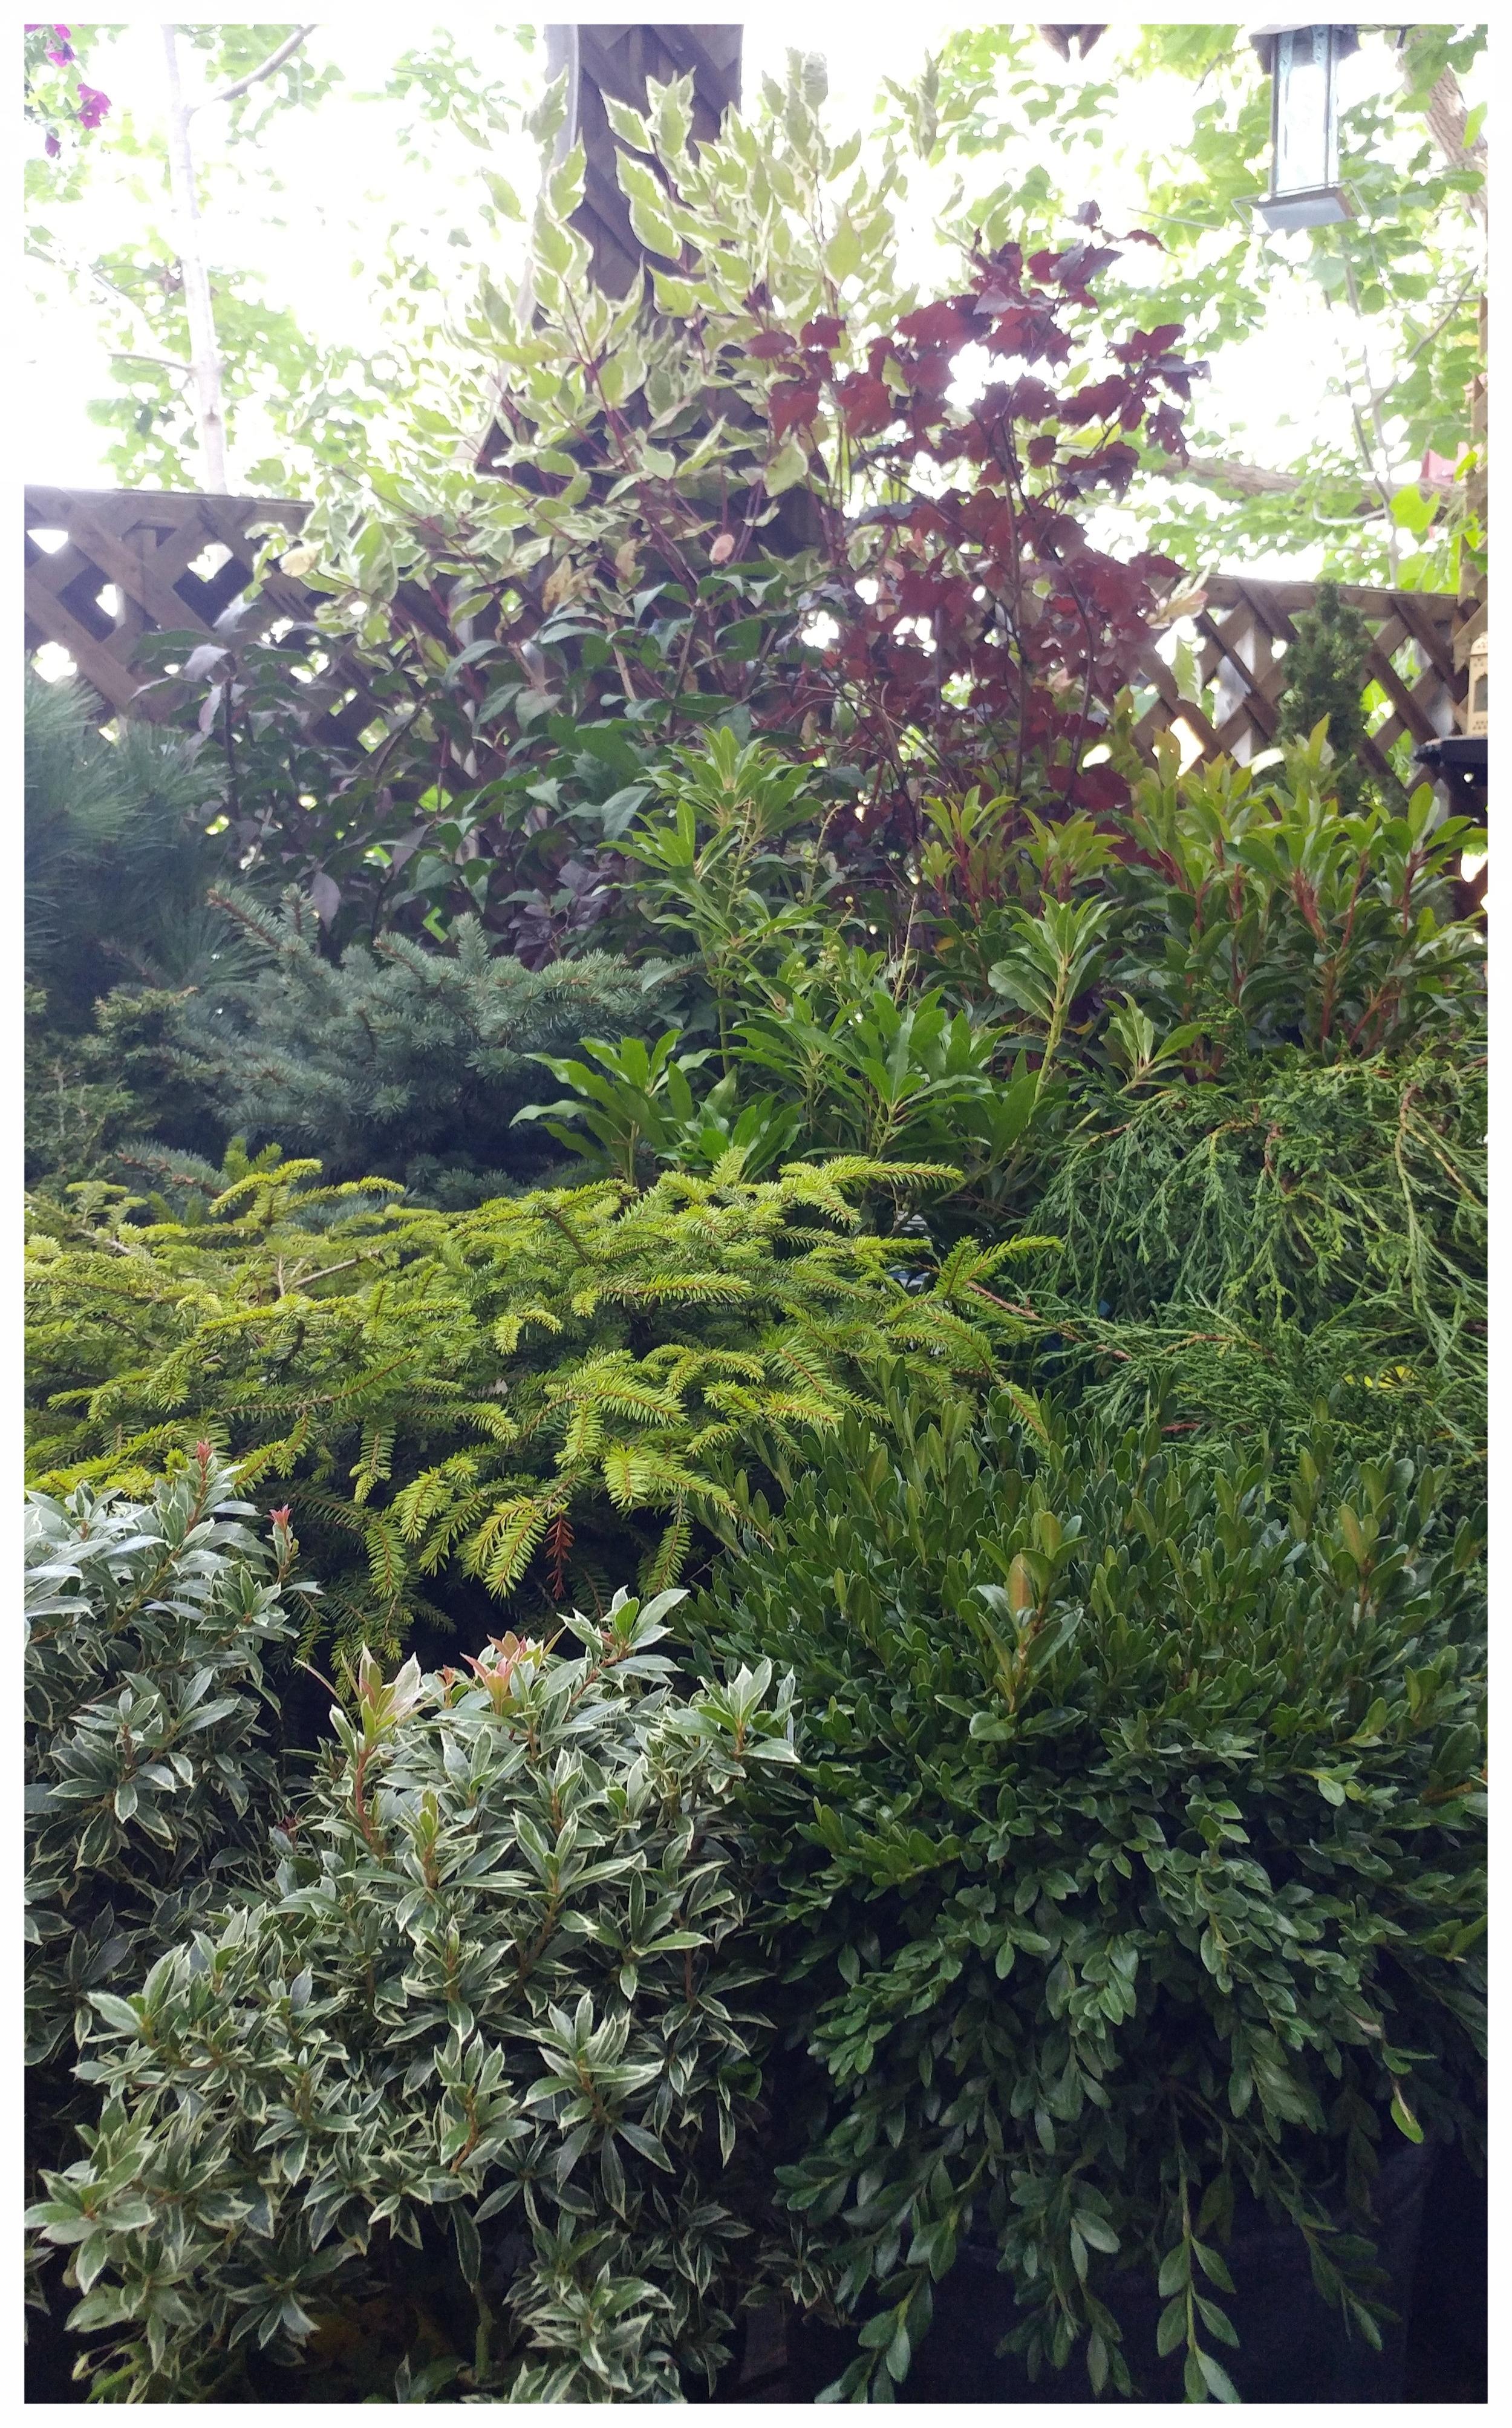 A collection of fall foliage waits to be planted (kalmia, dwarf spruce, boxwood, false cypress, red-osior dogwood, ninebark, pieris and mugo pine).